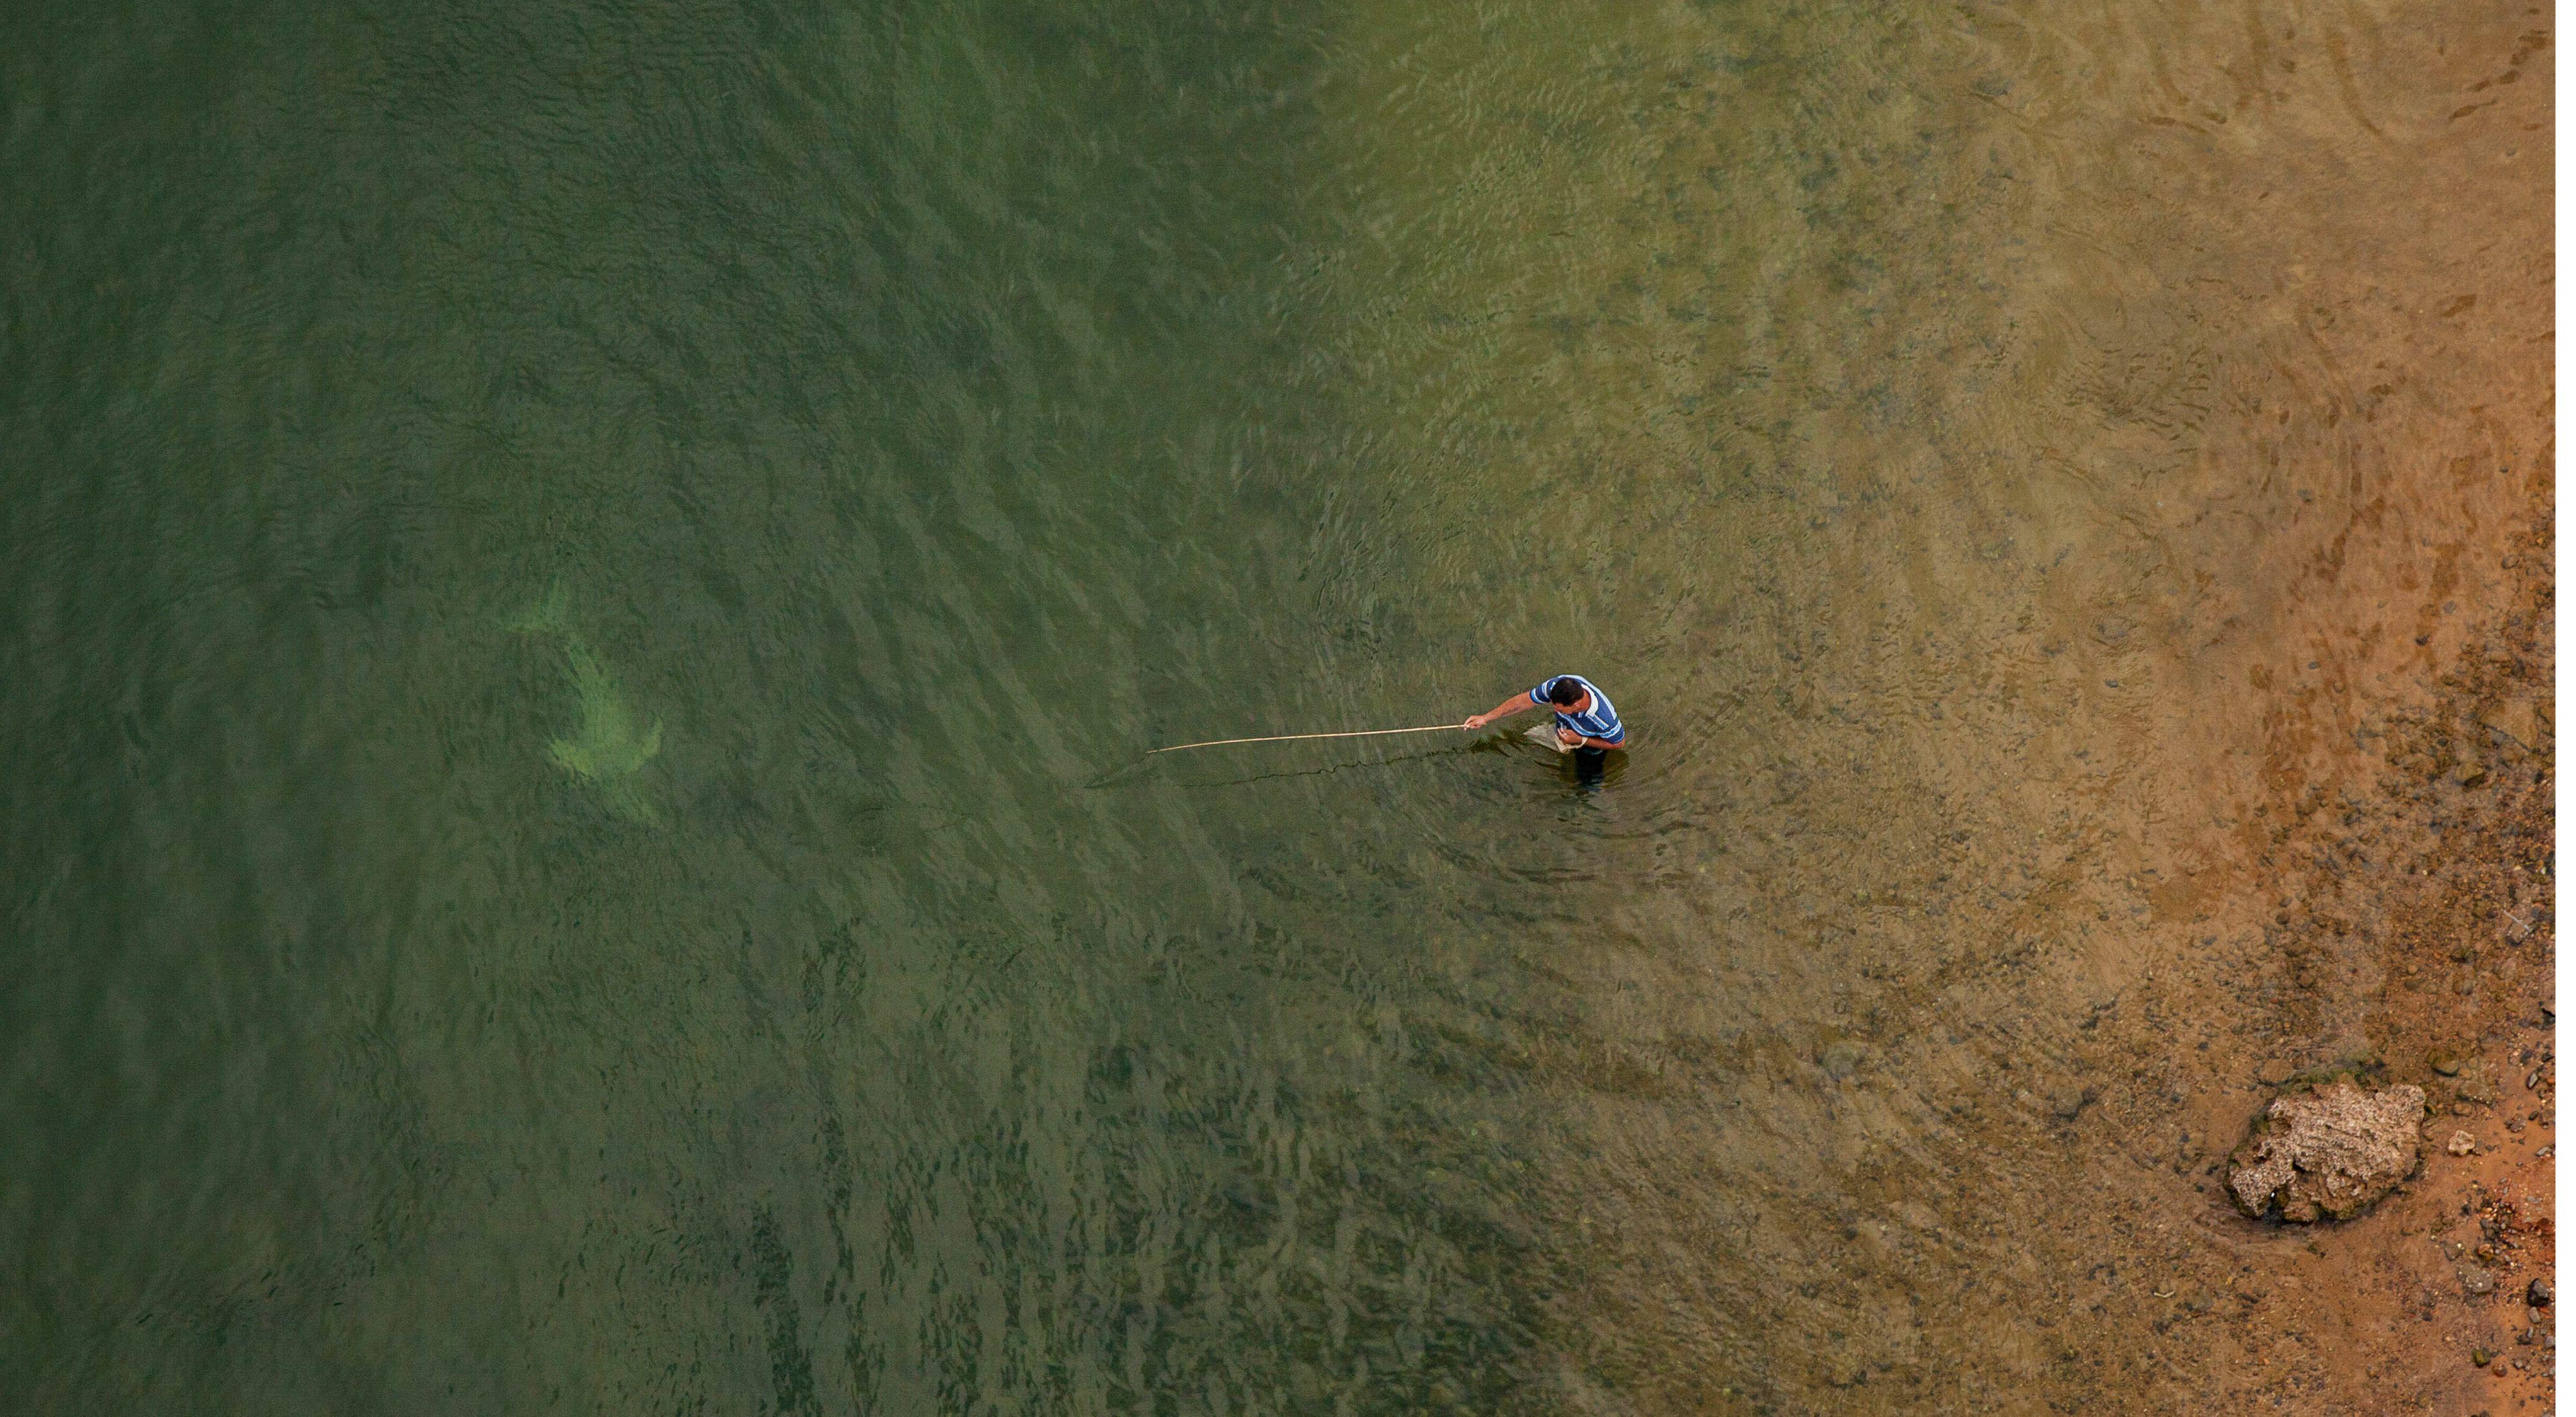 Boto do Araguaia (Inia araguaiaensis) nadando junto a un pescador local usando una caña de bambú para pescar en el río Tocantins, en Imperatriz-MA